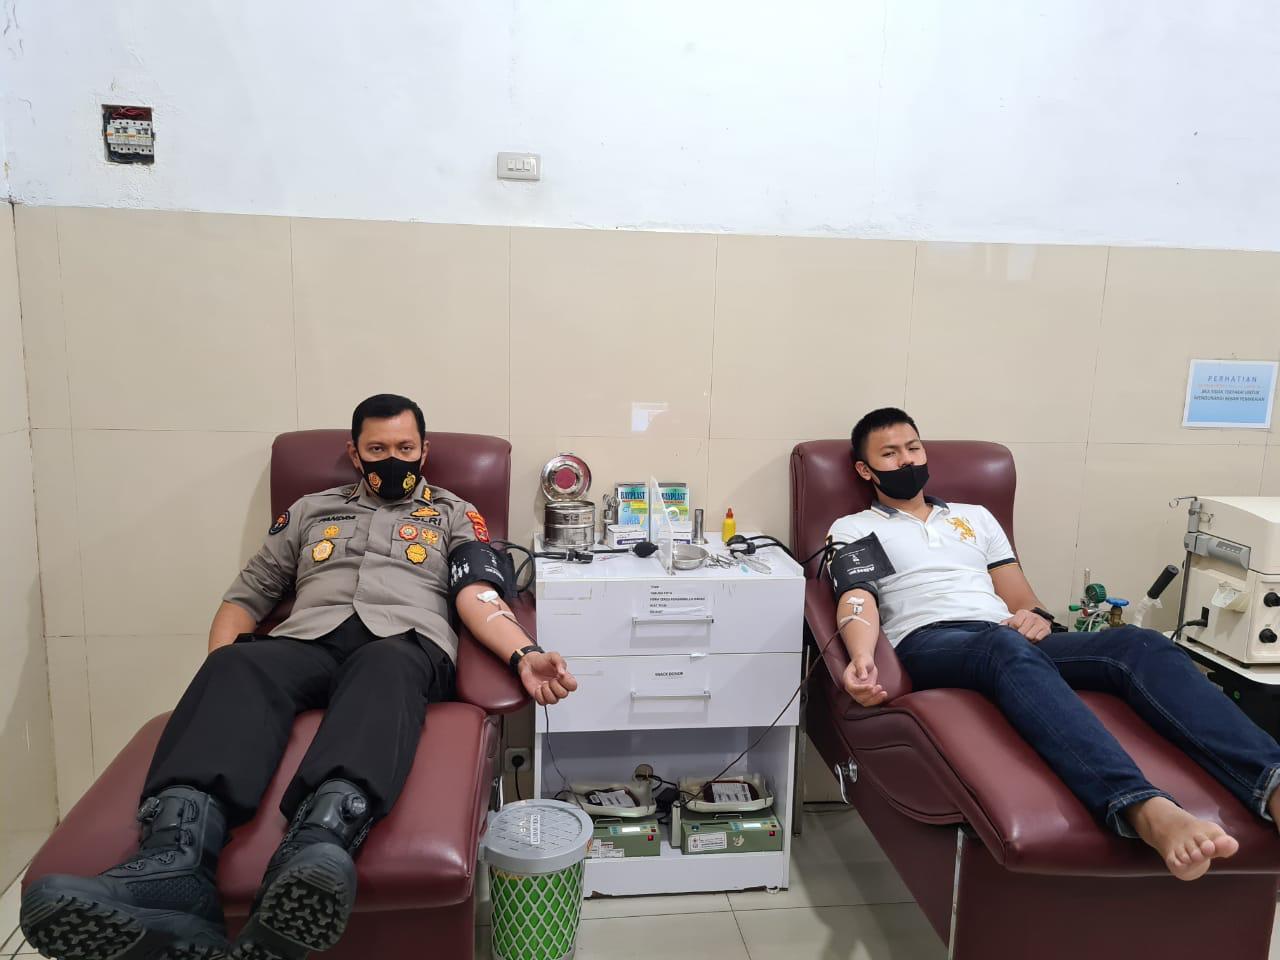 Sudah 115 Kali, Kabid Humas Polda Lampung Kombes Pol Zahwani Pandra Arsyad Mendonorkan Darahnya